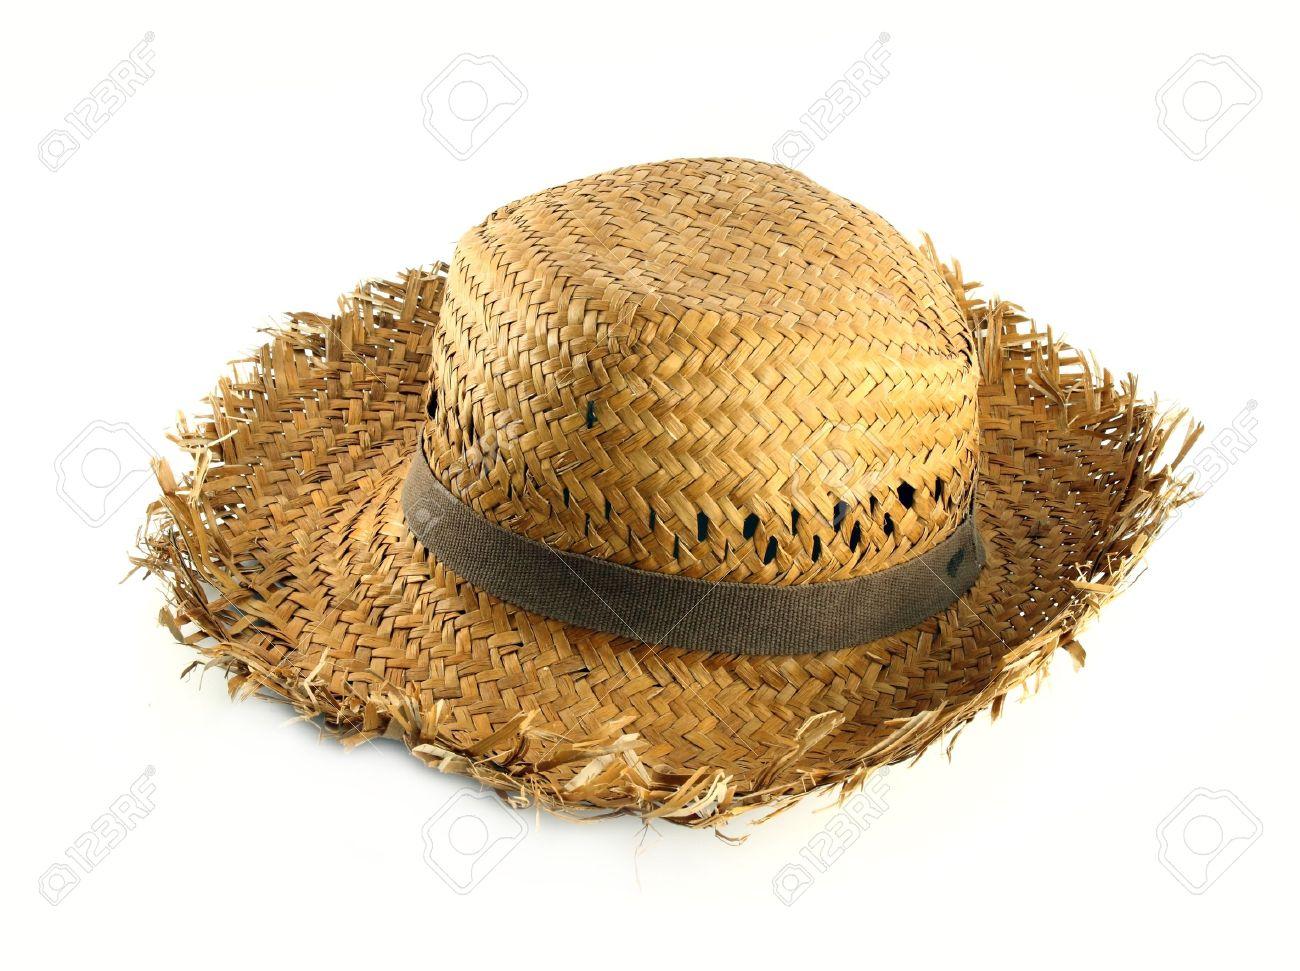 sombrero paja sombrero de paja en el fondo blanco